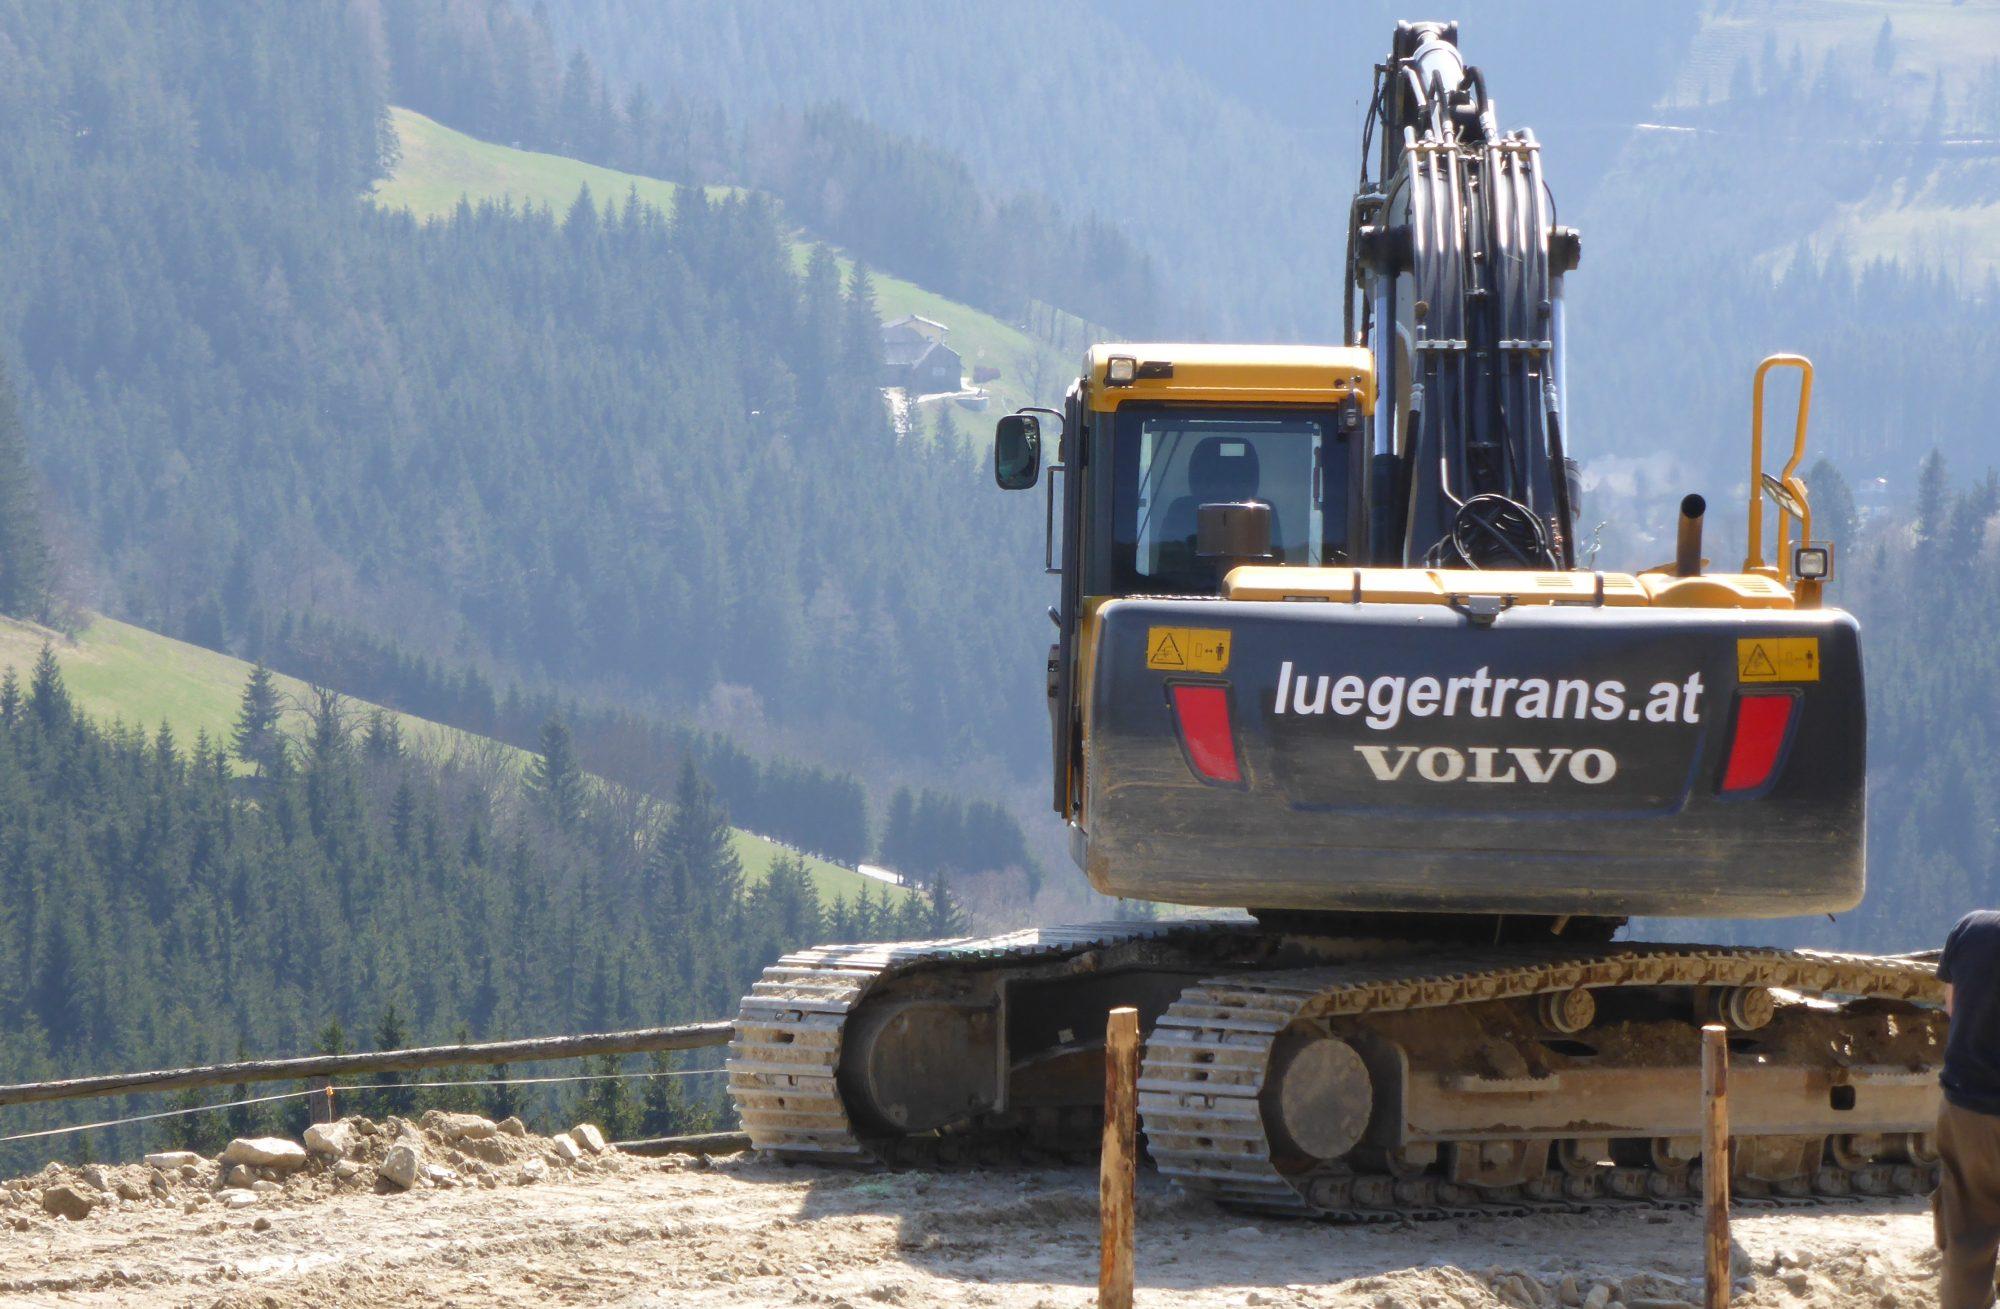 Transporte & Erdbewegung Lueger